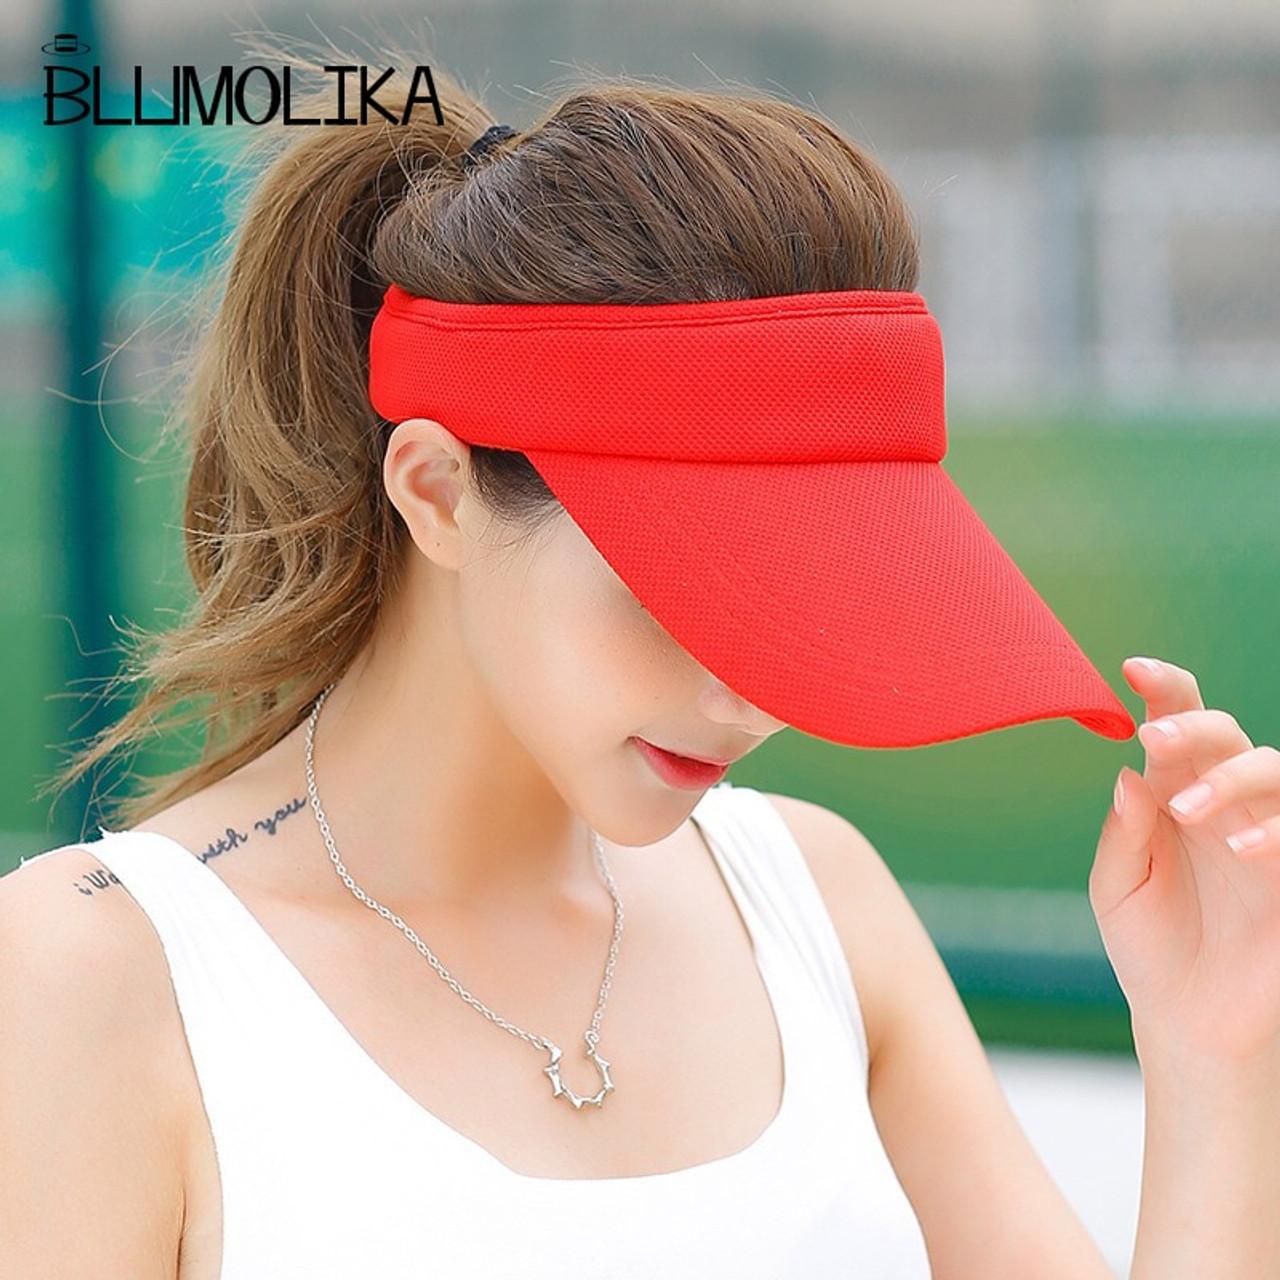 69bbf8e7 ... Hot Selling New Tennis Caps Stylish Women Men Unisex Beach Sports Sun  Visor Hat Golf Caps ...